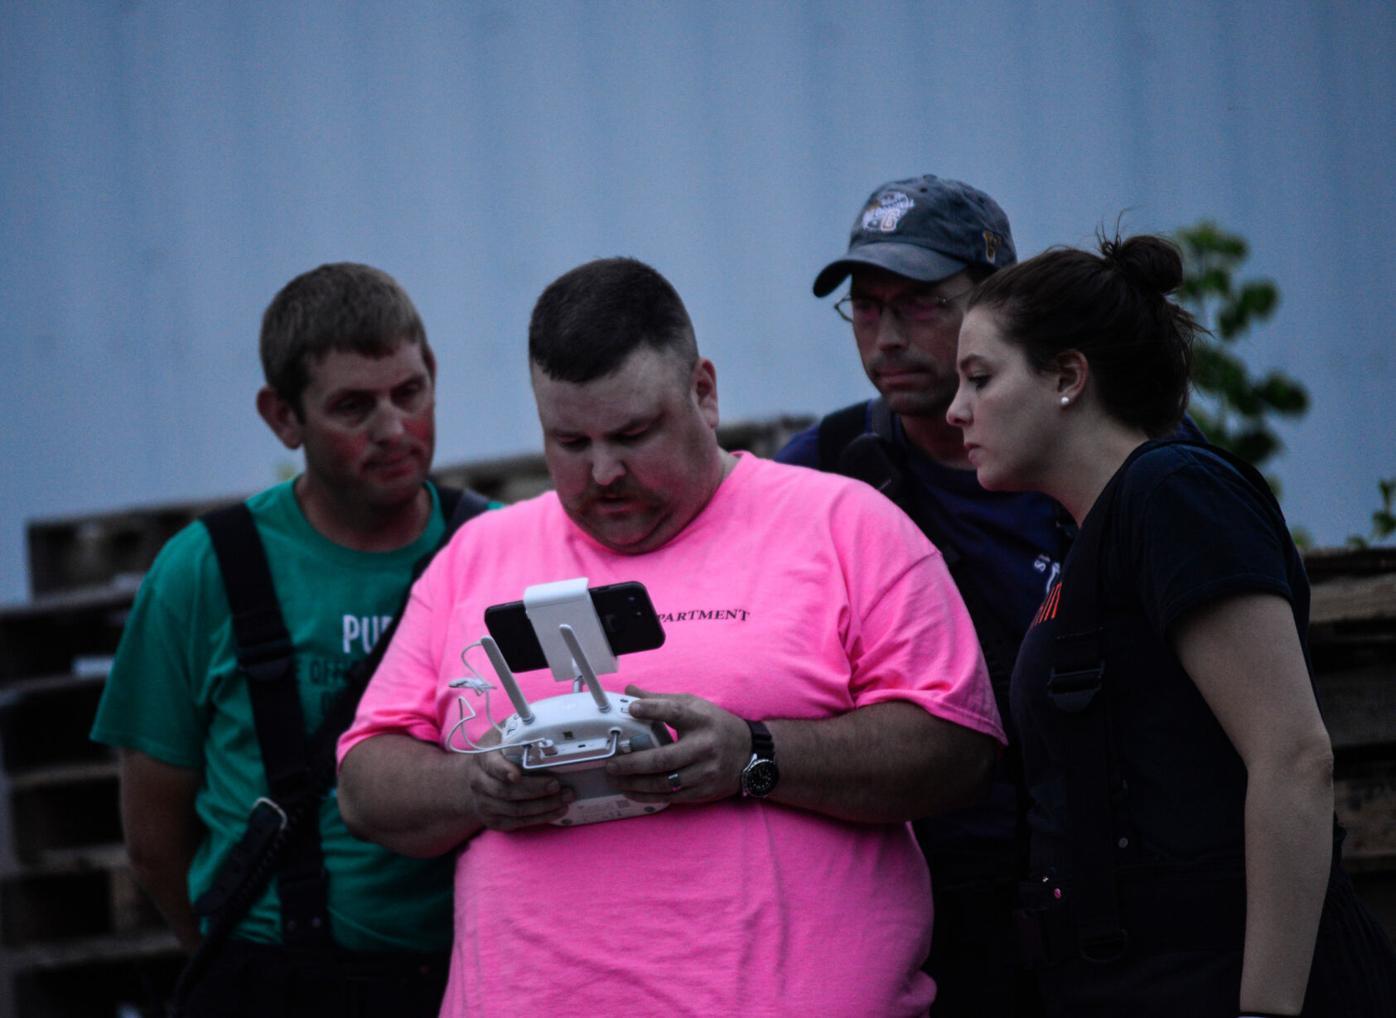 No injuries in powered parachute crash in Swanzey, N.H.